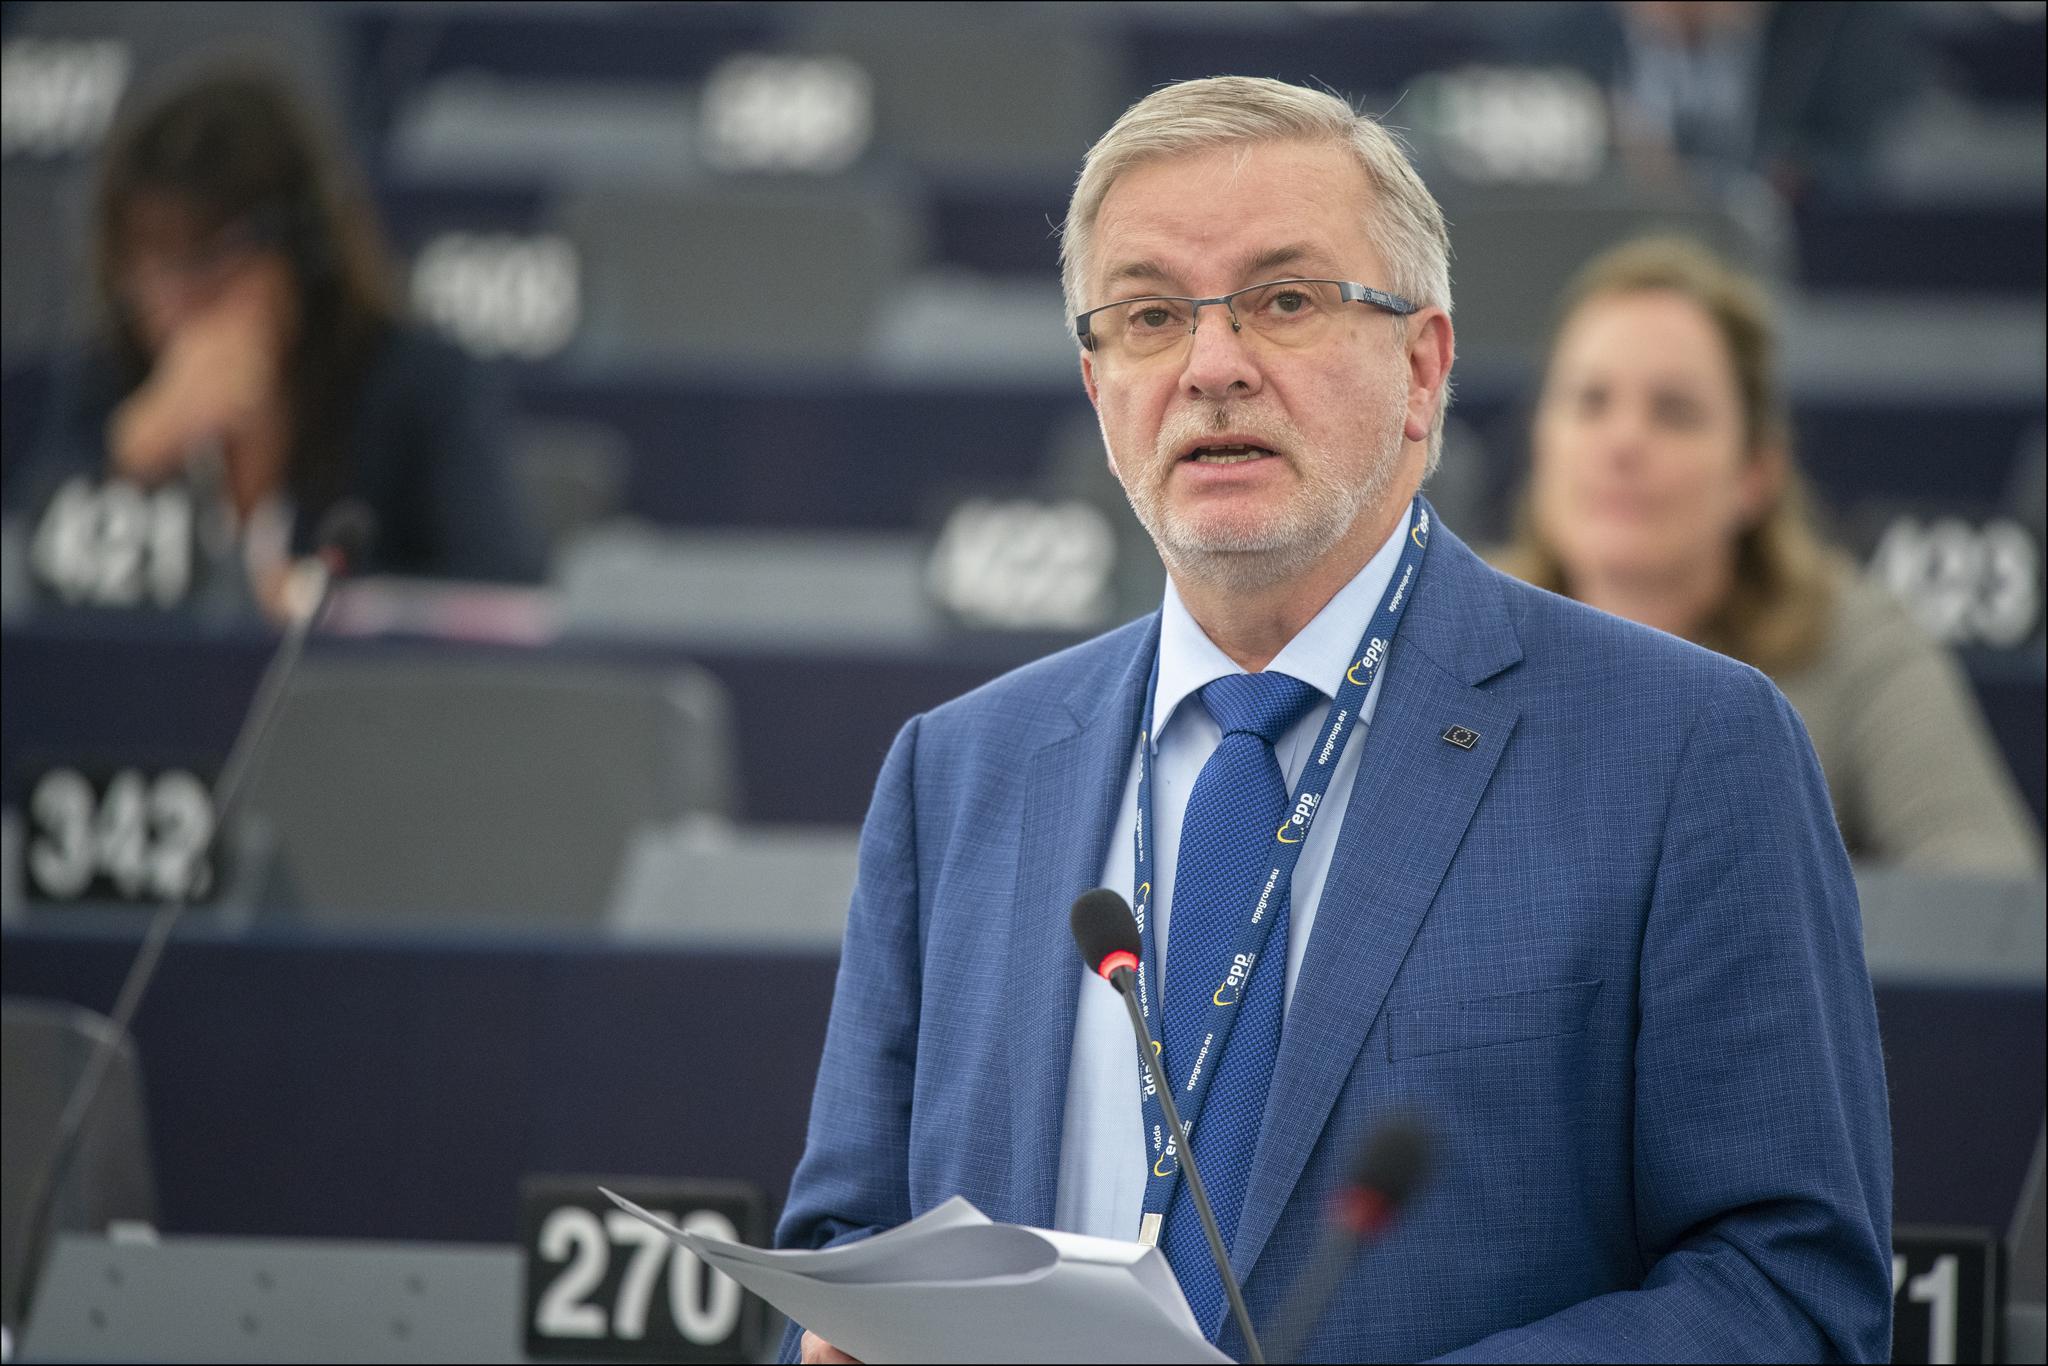 Bespomoćni EU u Nagorno Karabahu Debate_MEPs_call_for_measures_against_Turkey_following_military_operation_in_Syria_%2848948321112%29